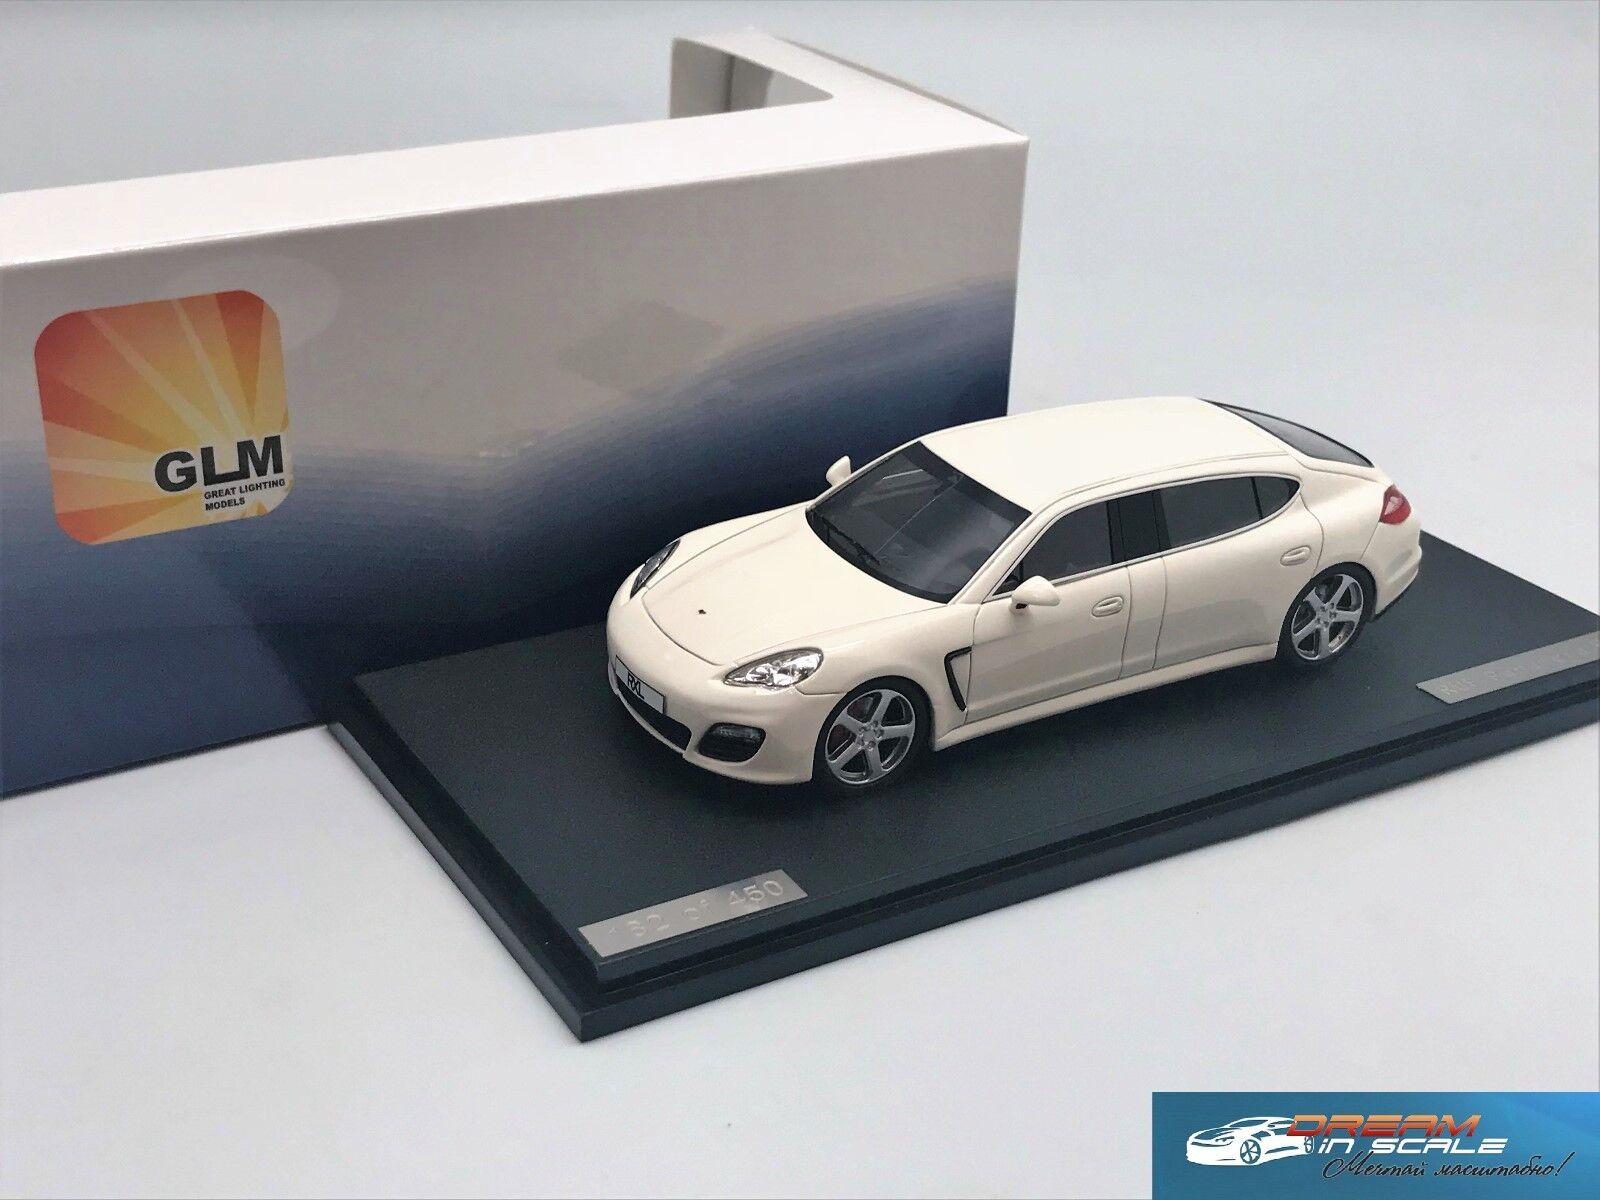 Porsche RUF Panamera RXL 2012 GLM GLM214001 1 43